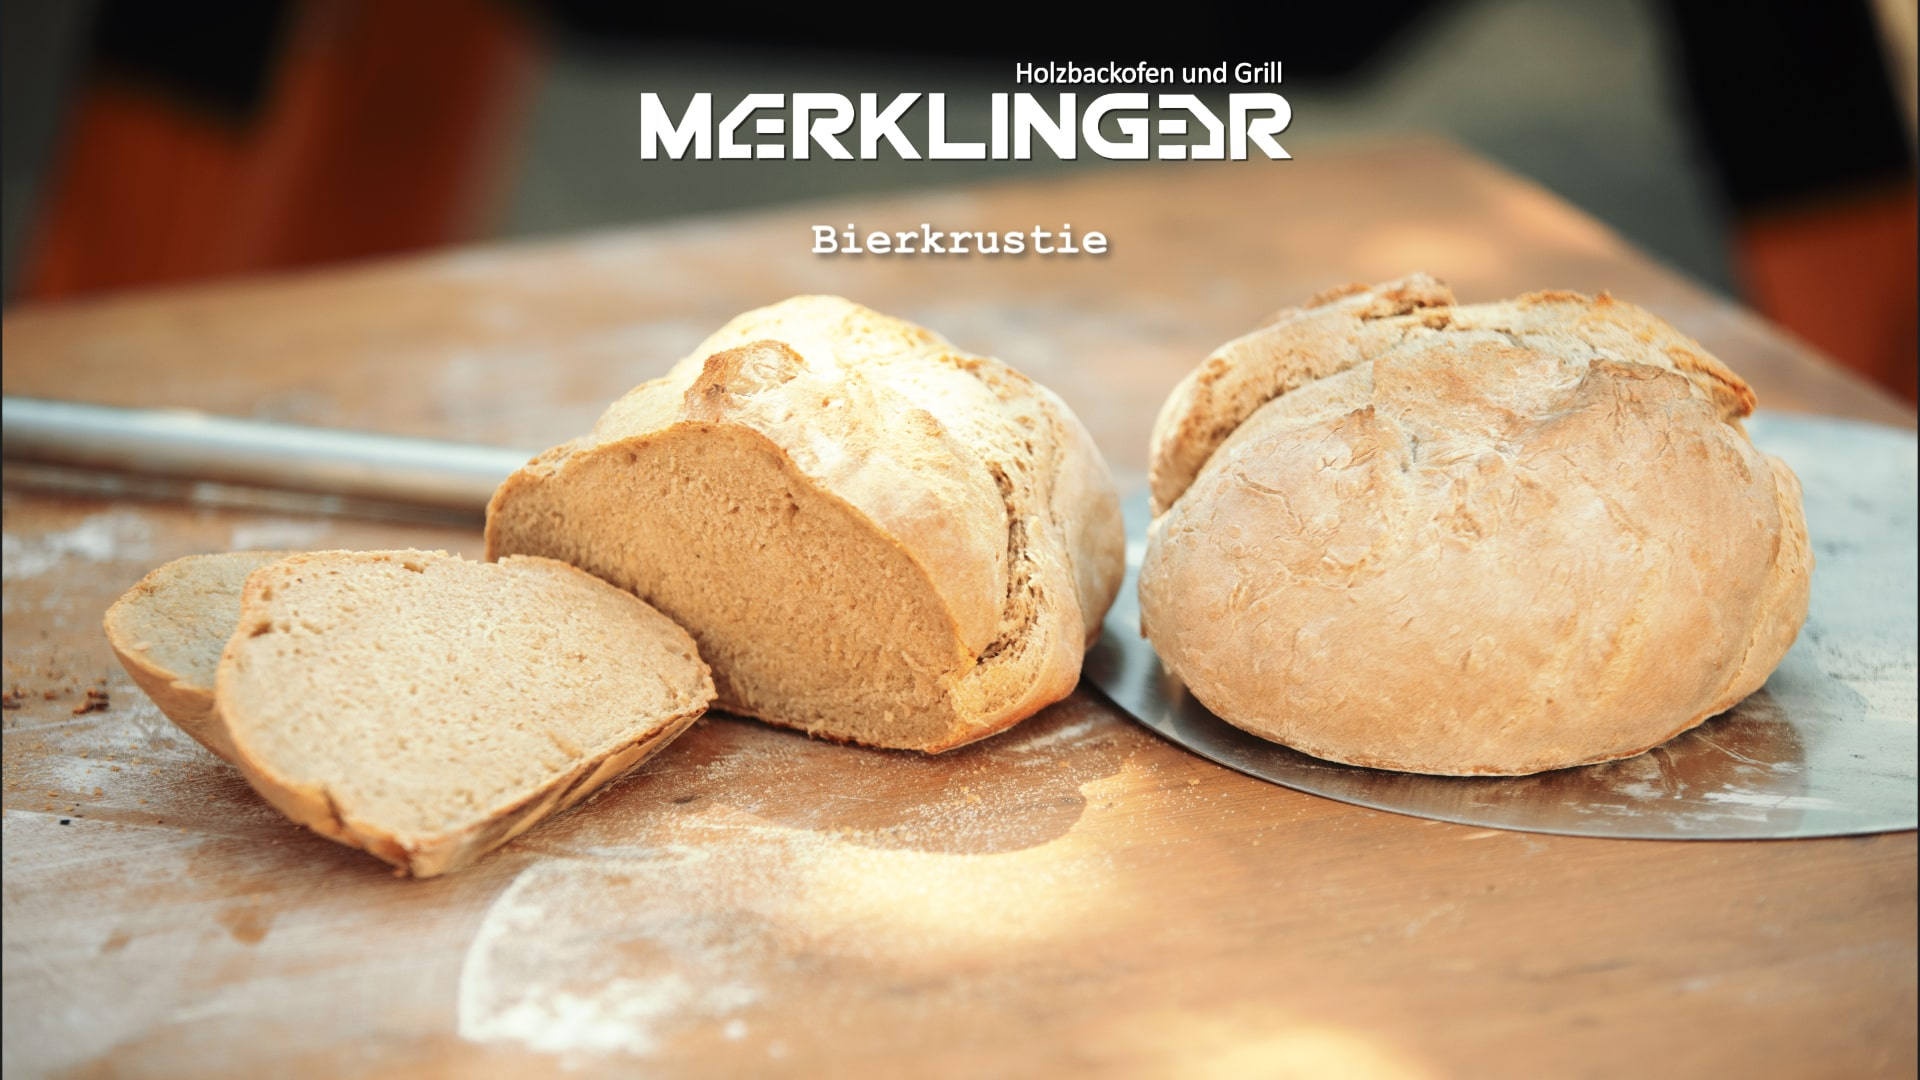 Merklinger Holzbackofen Grill Pizzaofen Brotbackofen Rezept Bierkrustie Brot